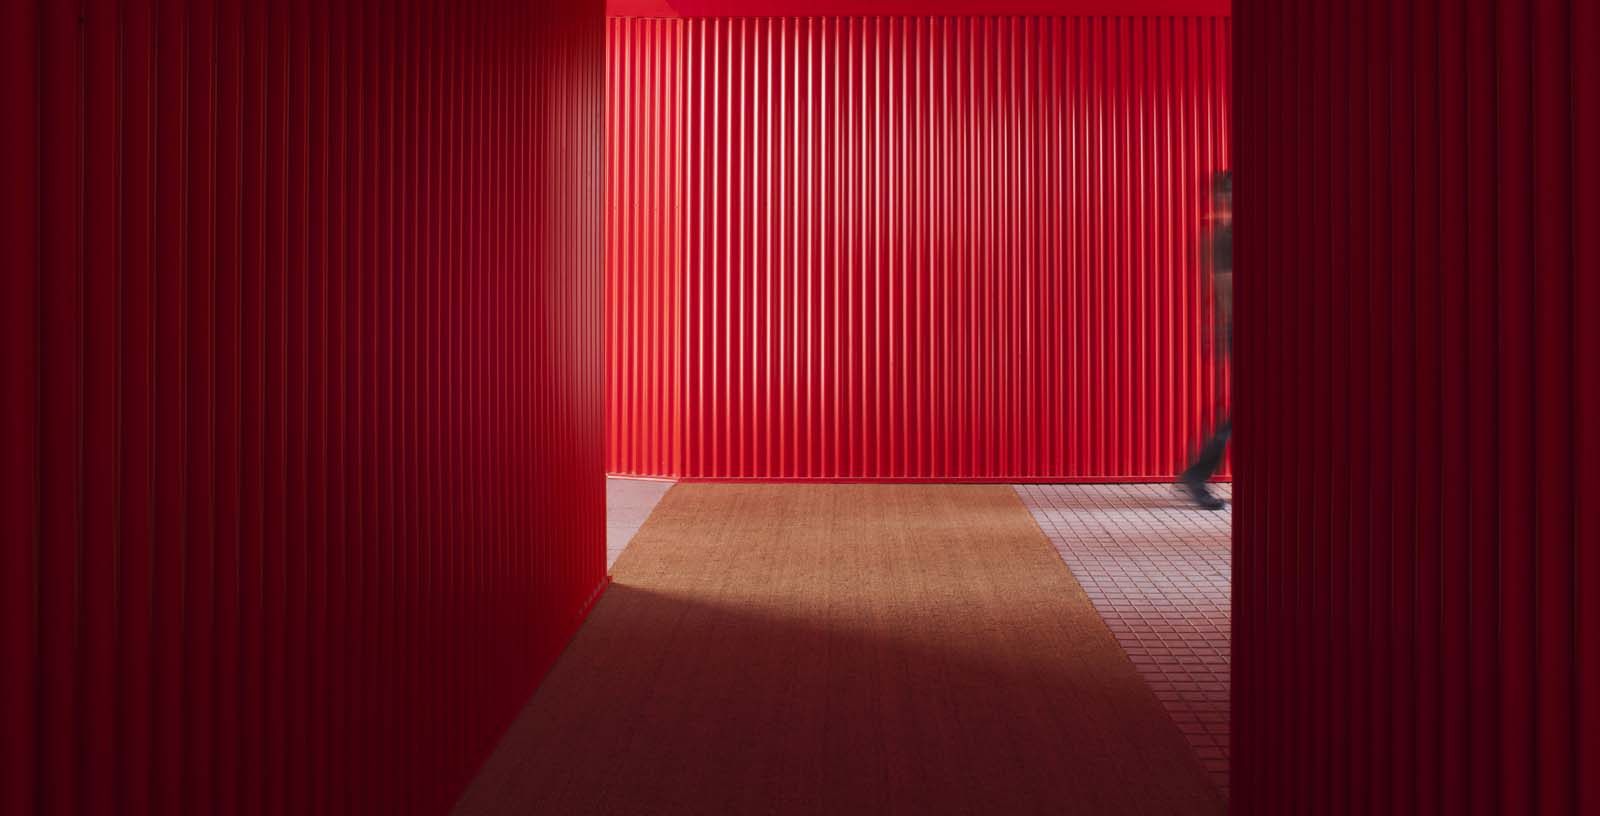 242_Salburua_Social_Housing_004_Architecture_IDOM_coyright_Aitor_Ortiz